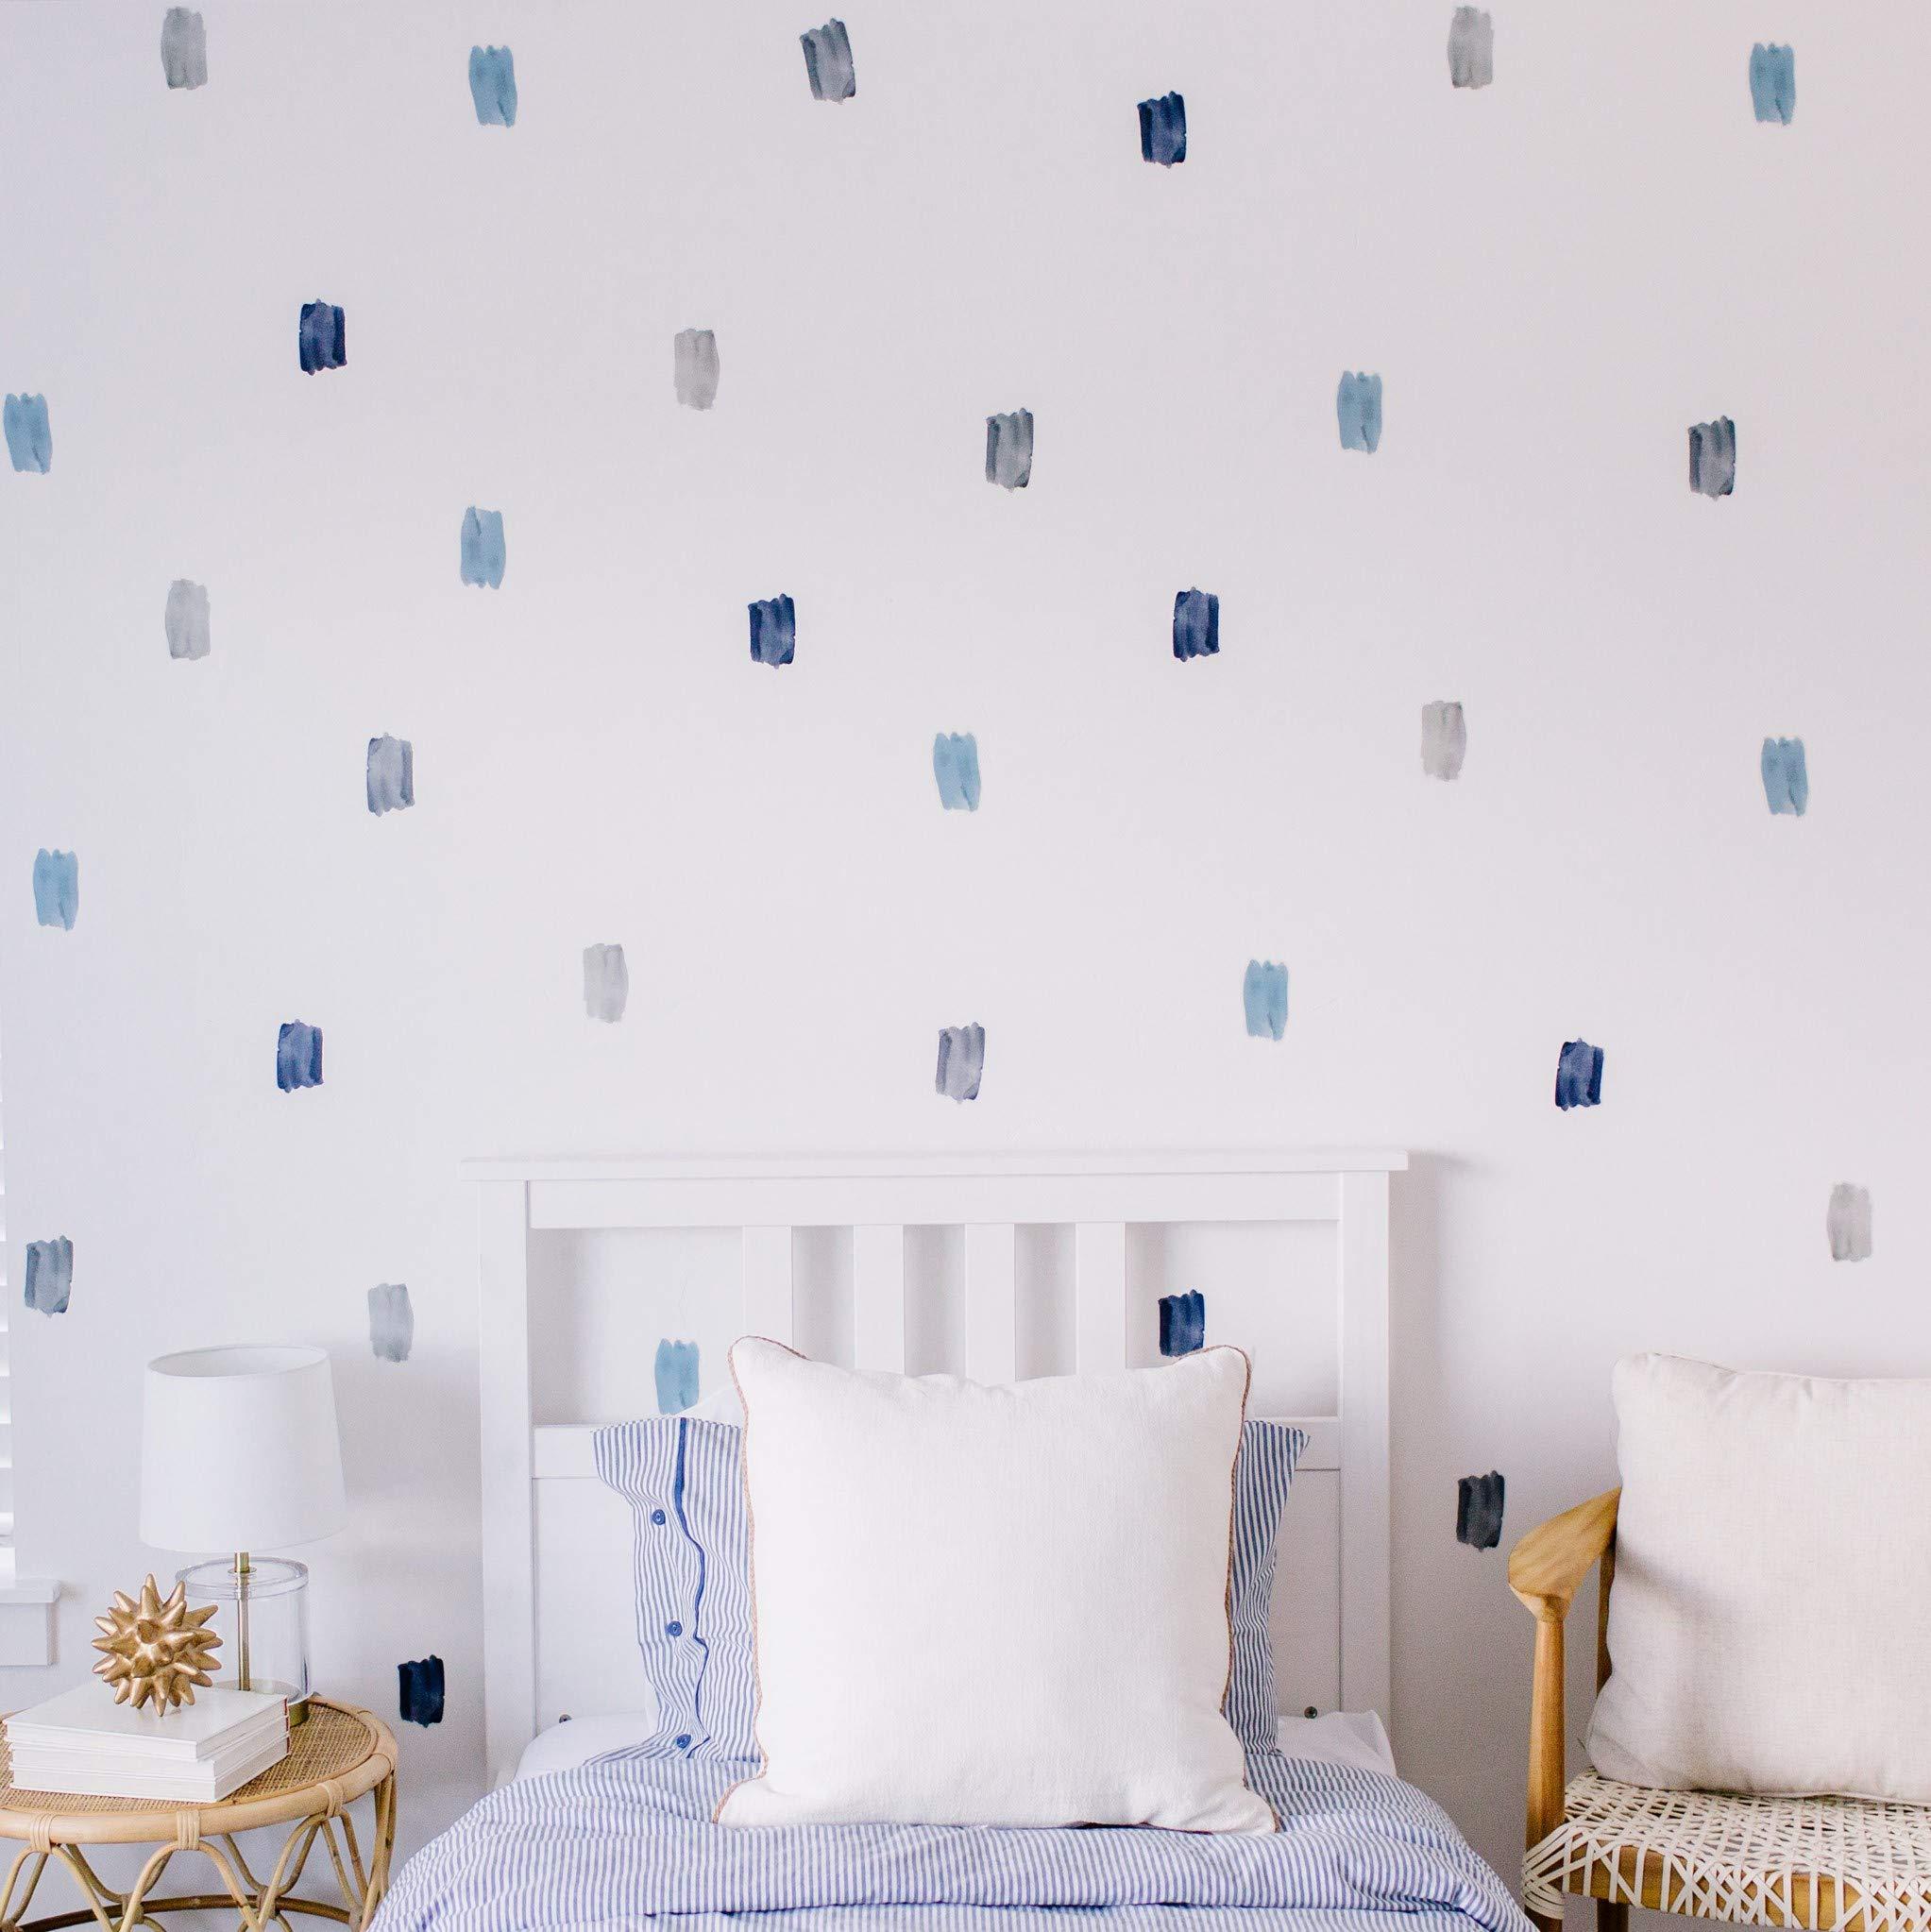 Modern Maxwell Wall Art Decals for Boys Nursery, Bedroom, Living Room ''Noah'' Brush Strokes Room Sticker 64 Pieces